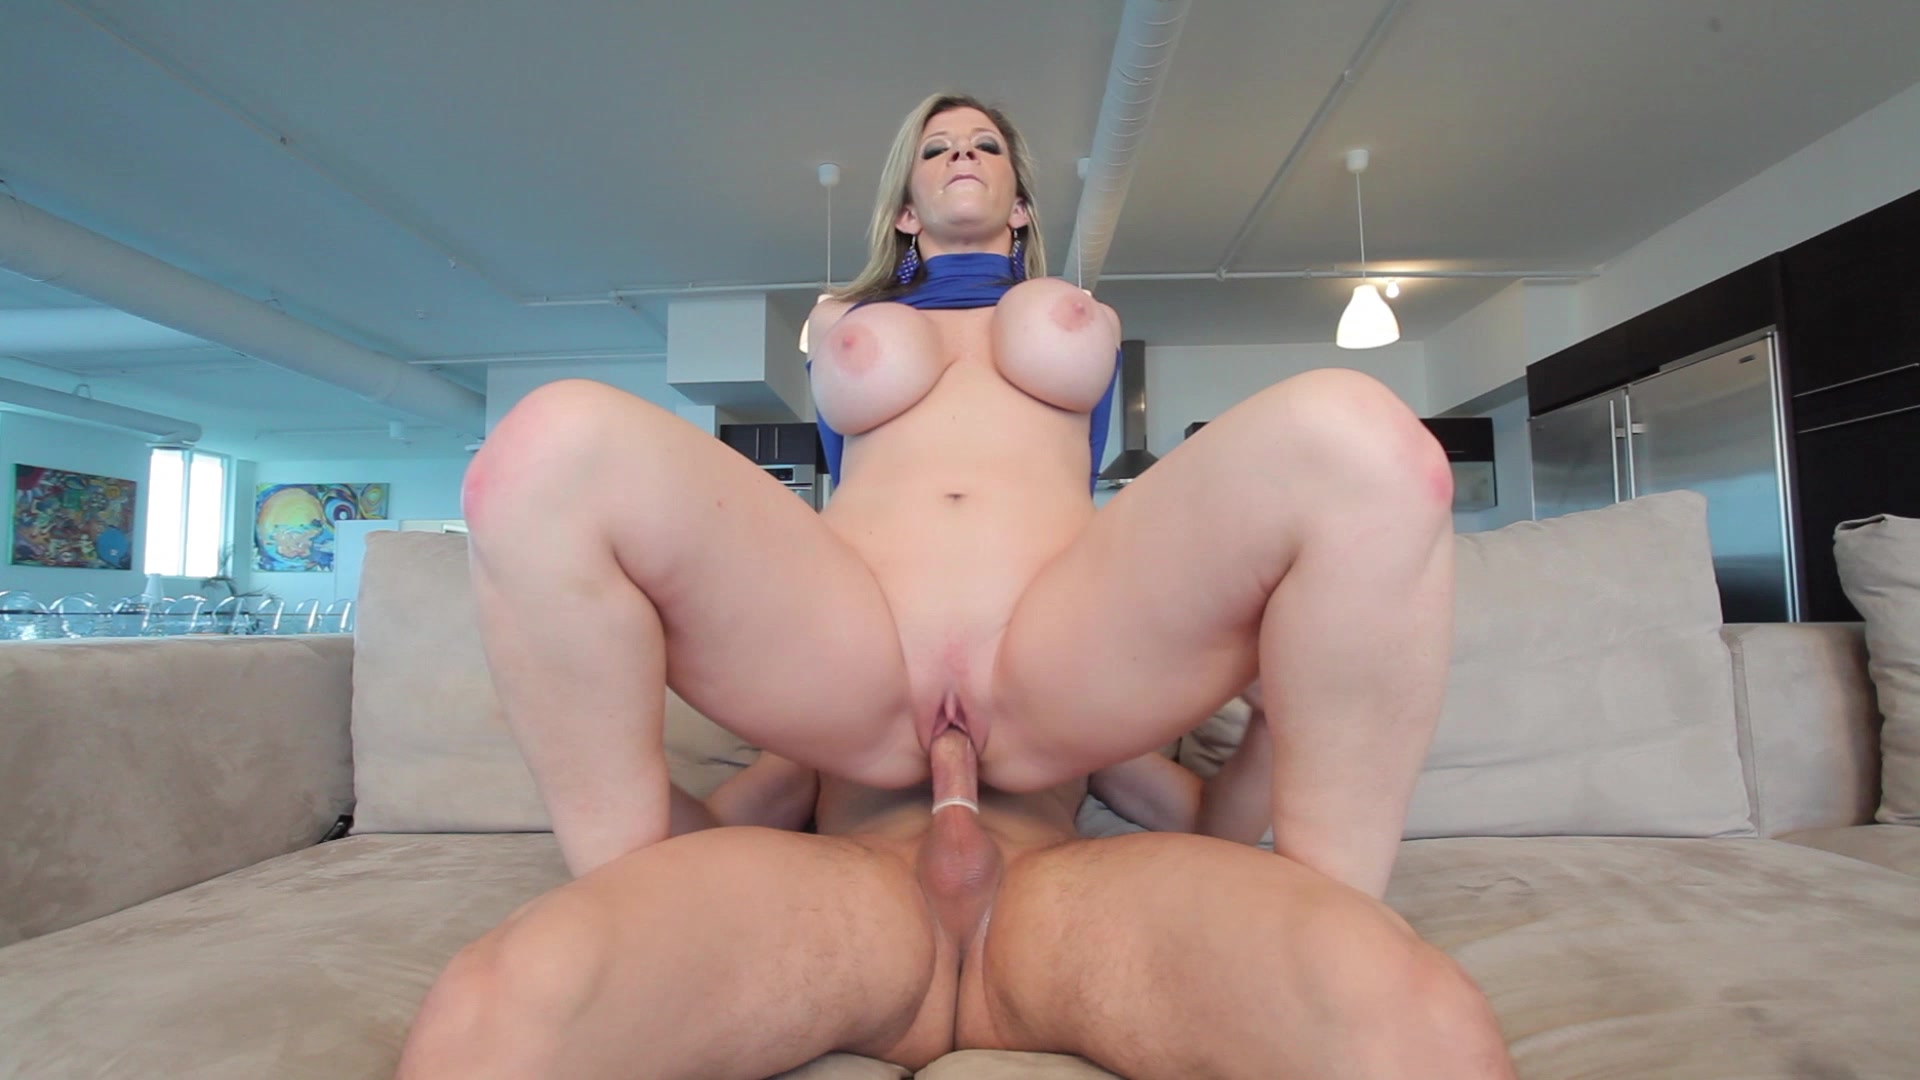 Sara Jay Loves To Fuck 2 2015  Adult Dvd Empire-5223